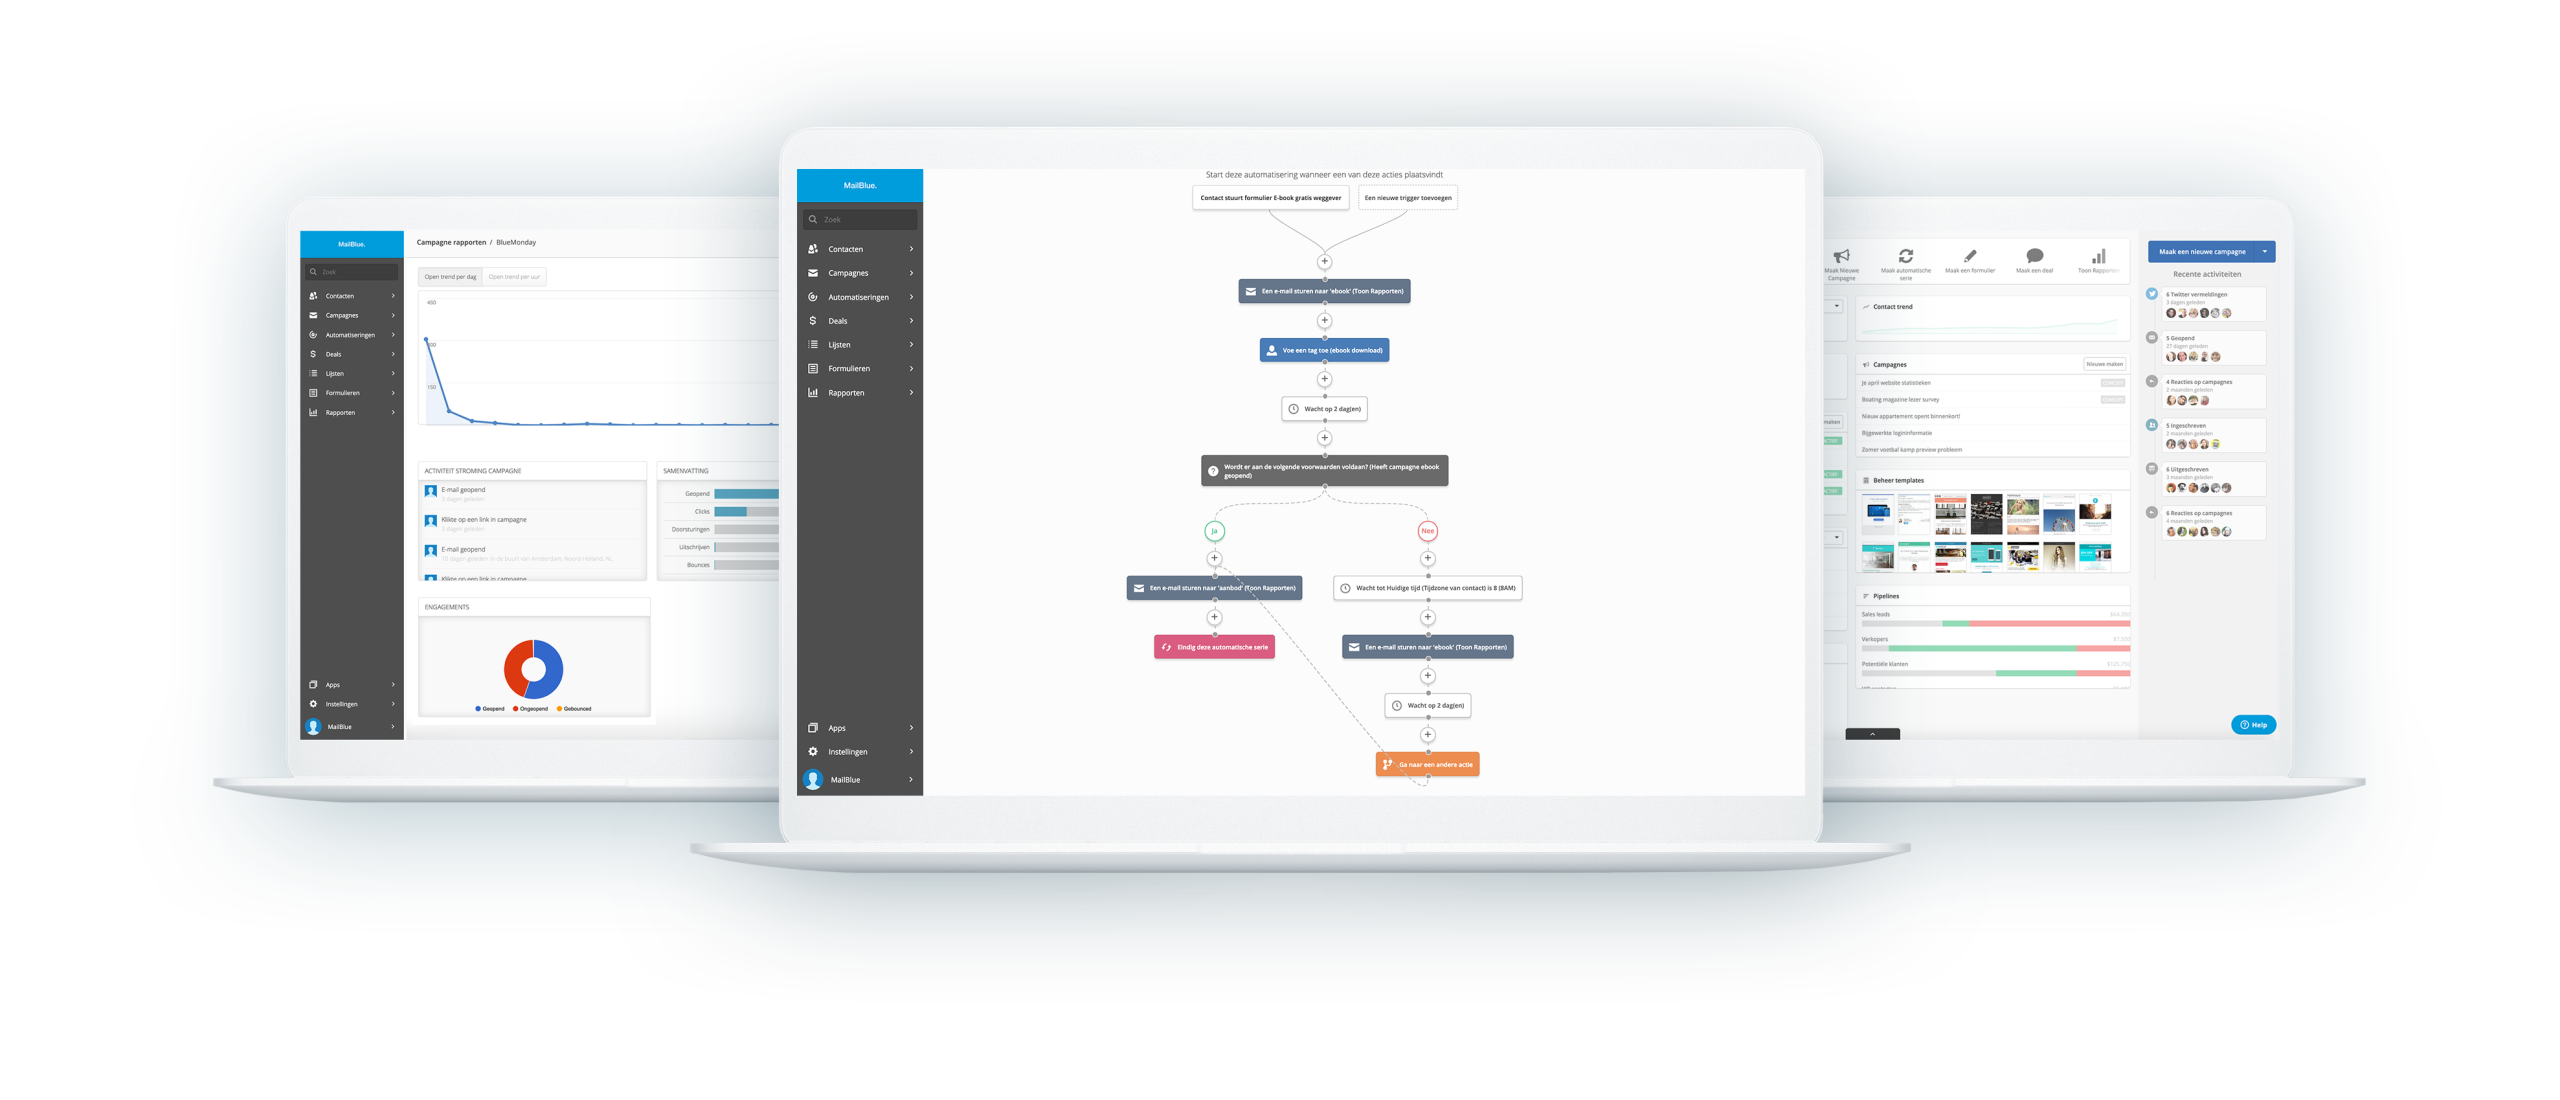 Mailblue review - De beste email marketing software?